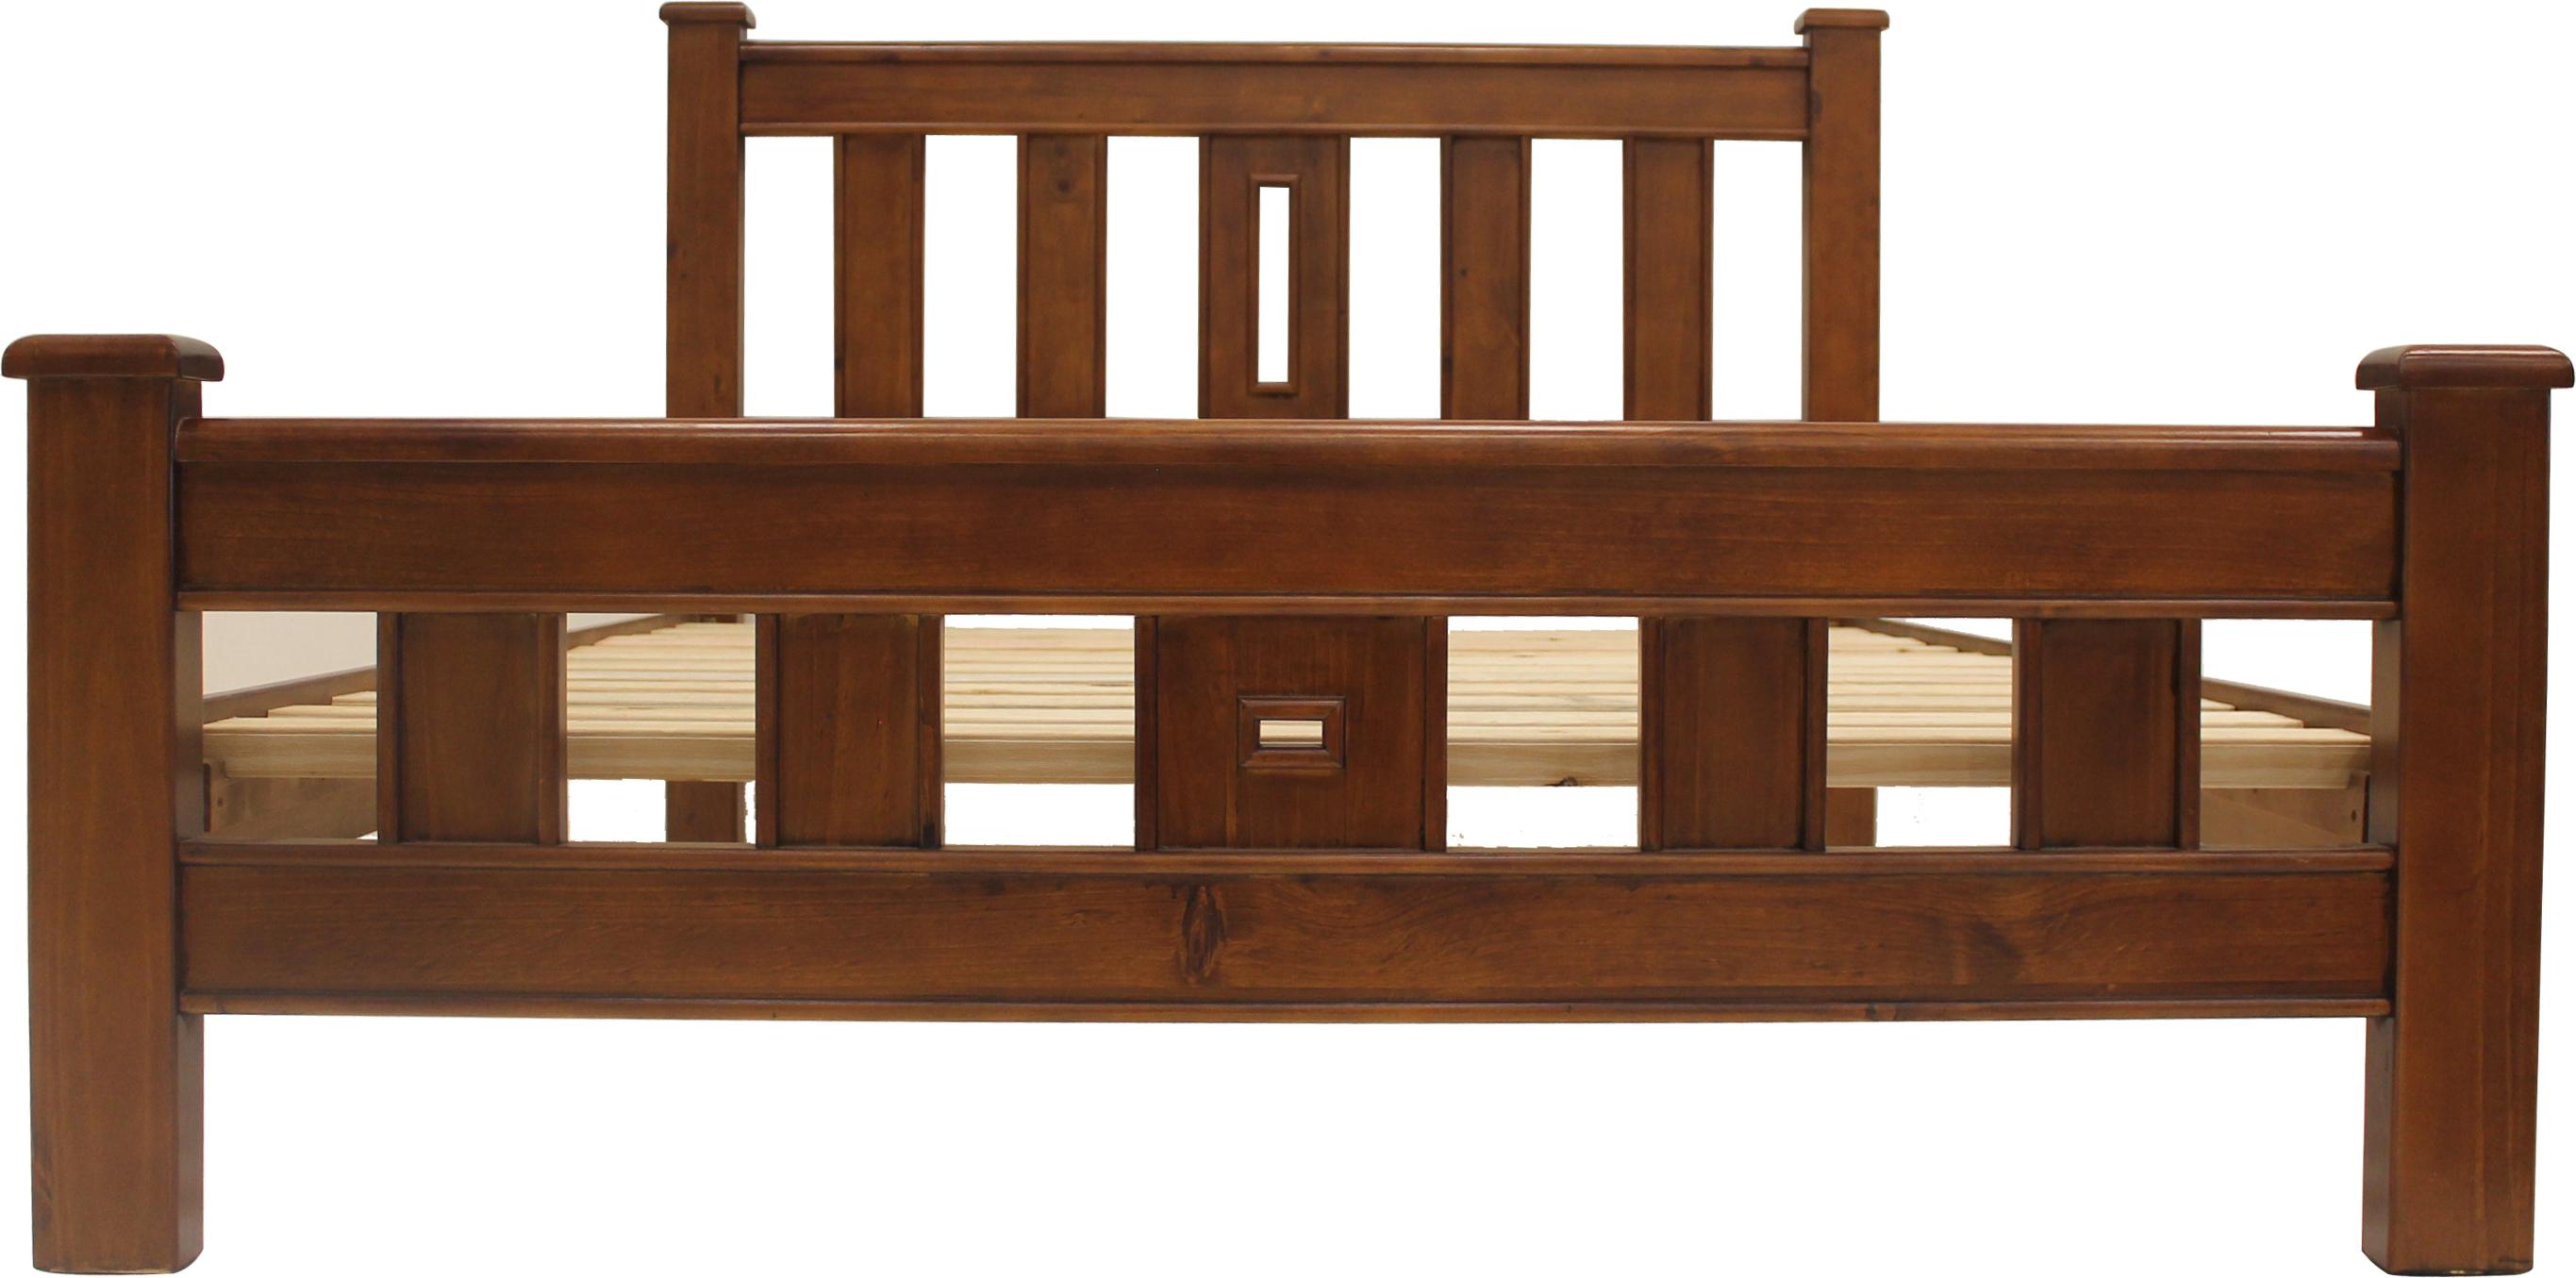 Olee Sleep 18inch Tall Round Edge Steel Slat Bed Frame S